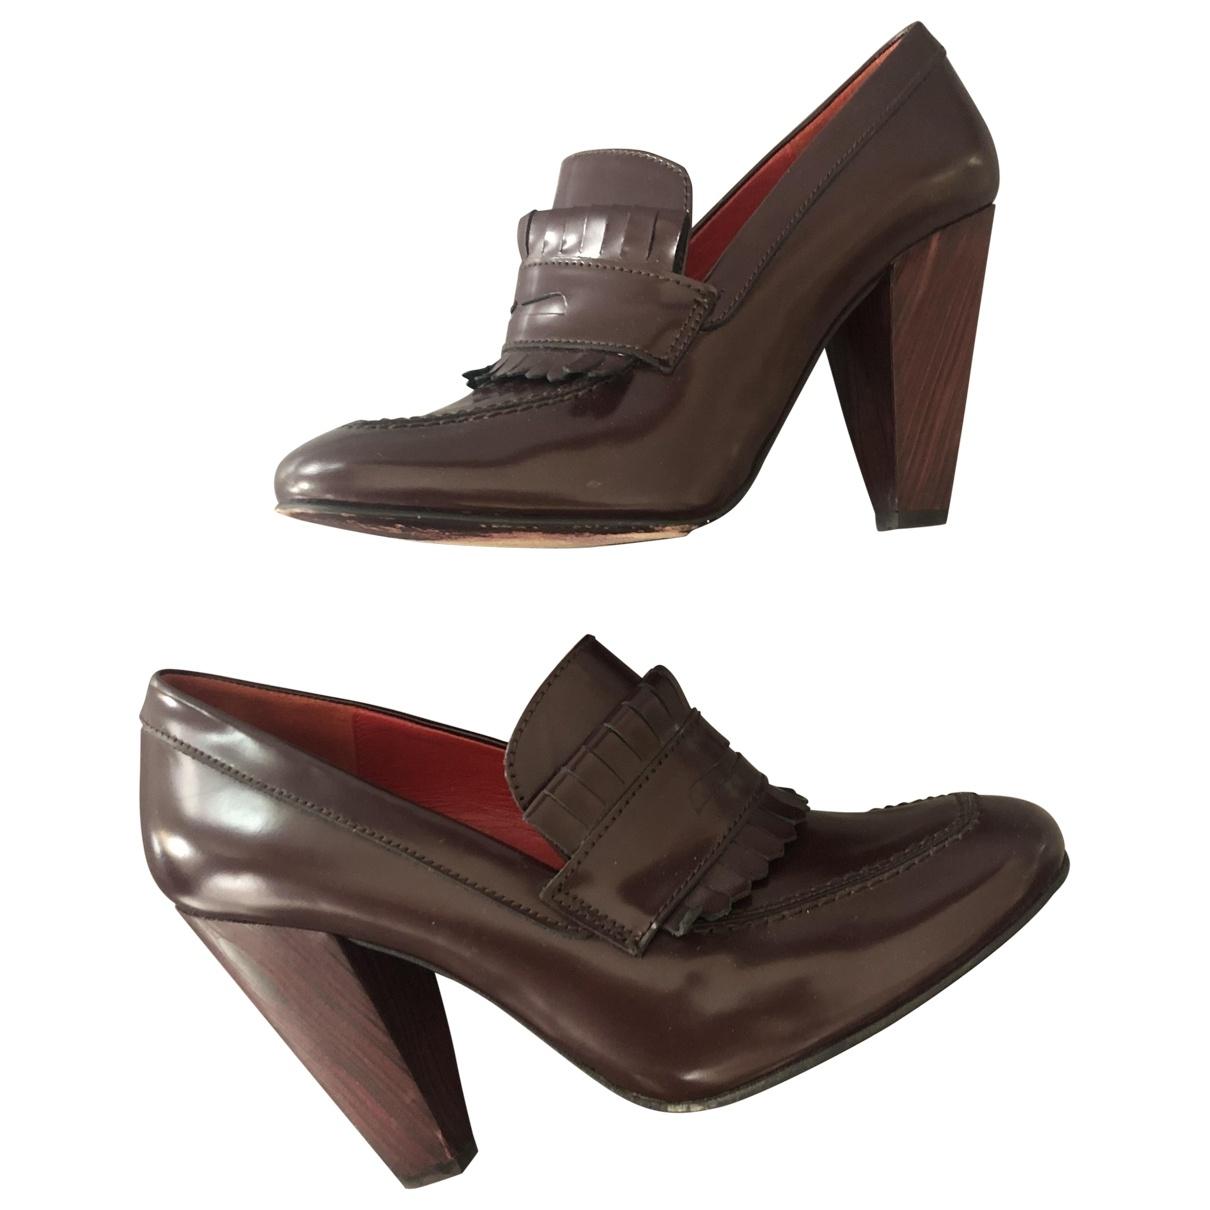 Tommy Hilfiger \N Burgundy Patent leather Heels for Women 39 EU